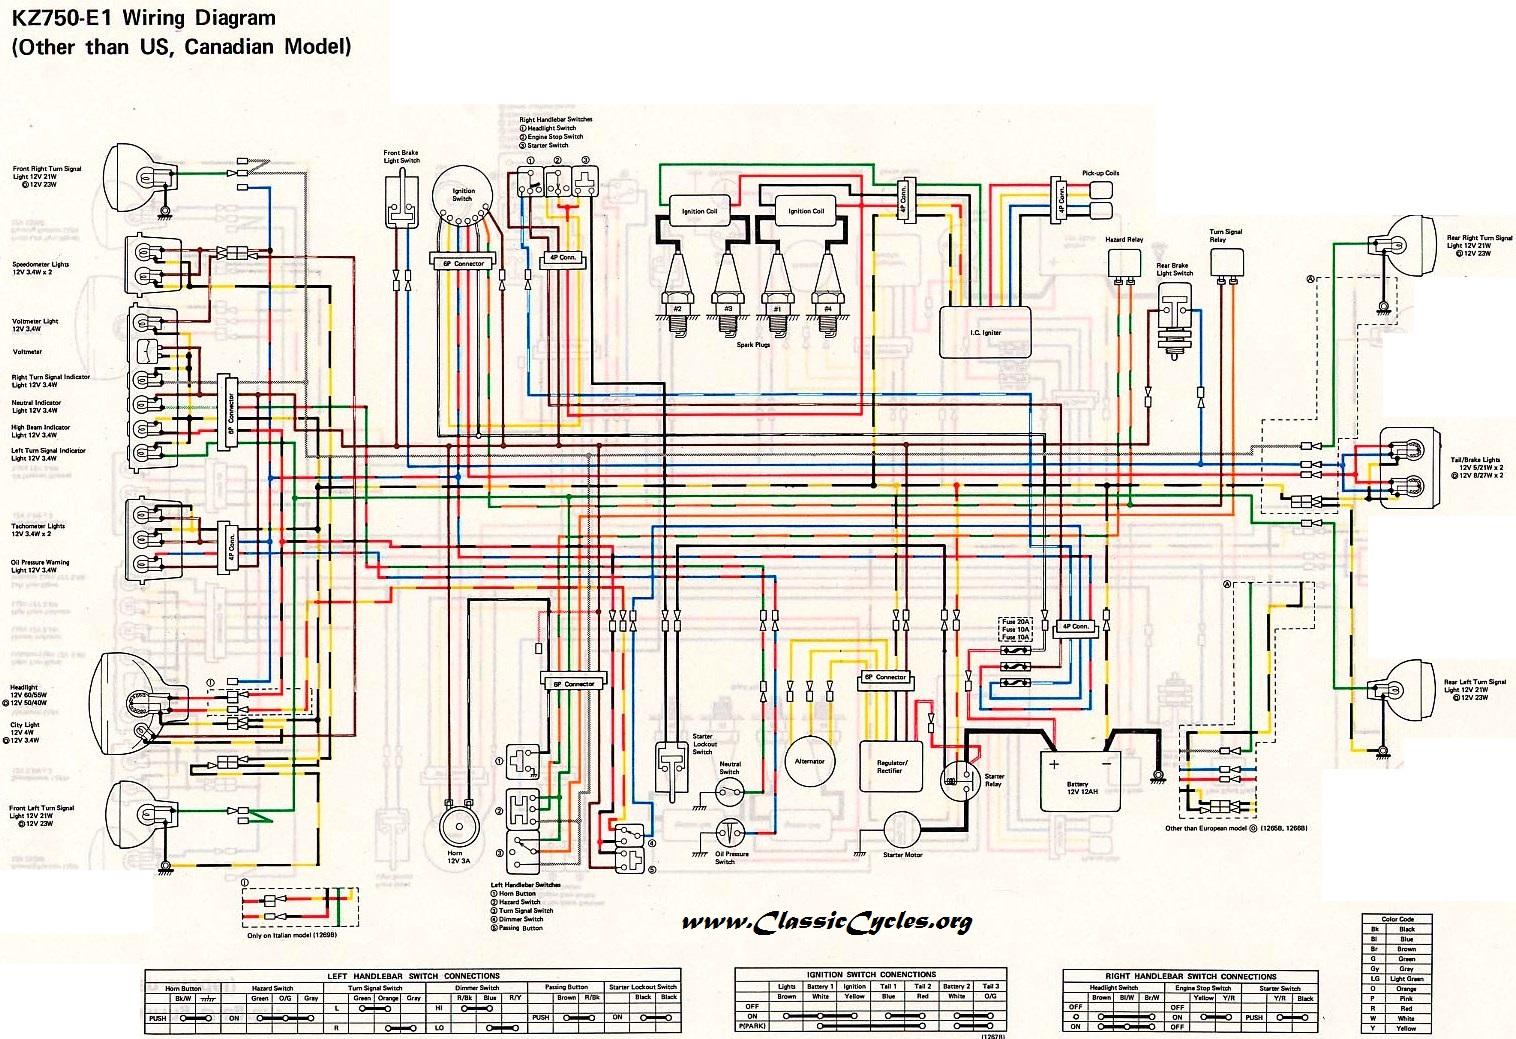 Kawasaki Vulcan Ignition Wiring Diagram - 12 Volt Light Relay Wiring Diagram  - mazda3-sp23.tukune.jeanjaures37.fr | 1997 Vulcan Wiring Diagram |  | Wiring Diagram Resource